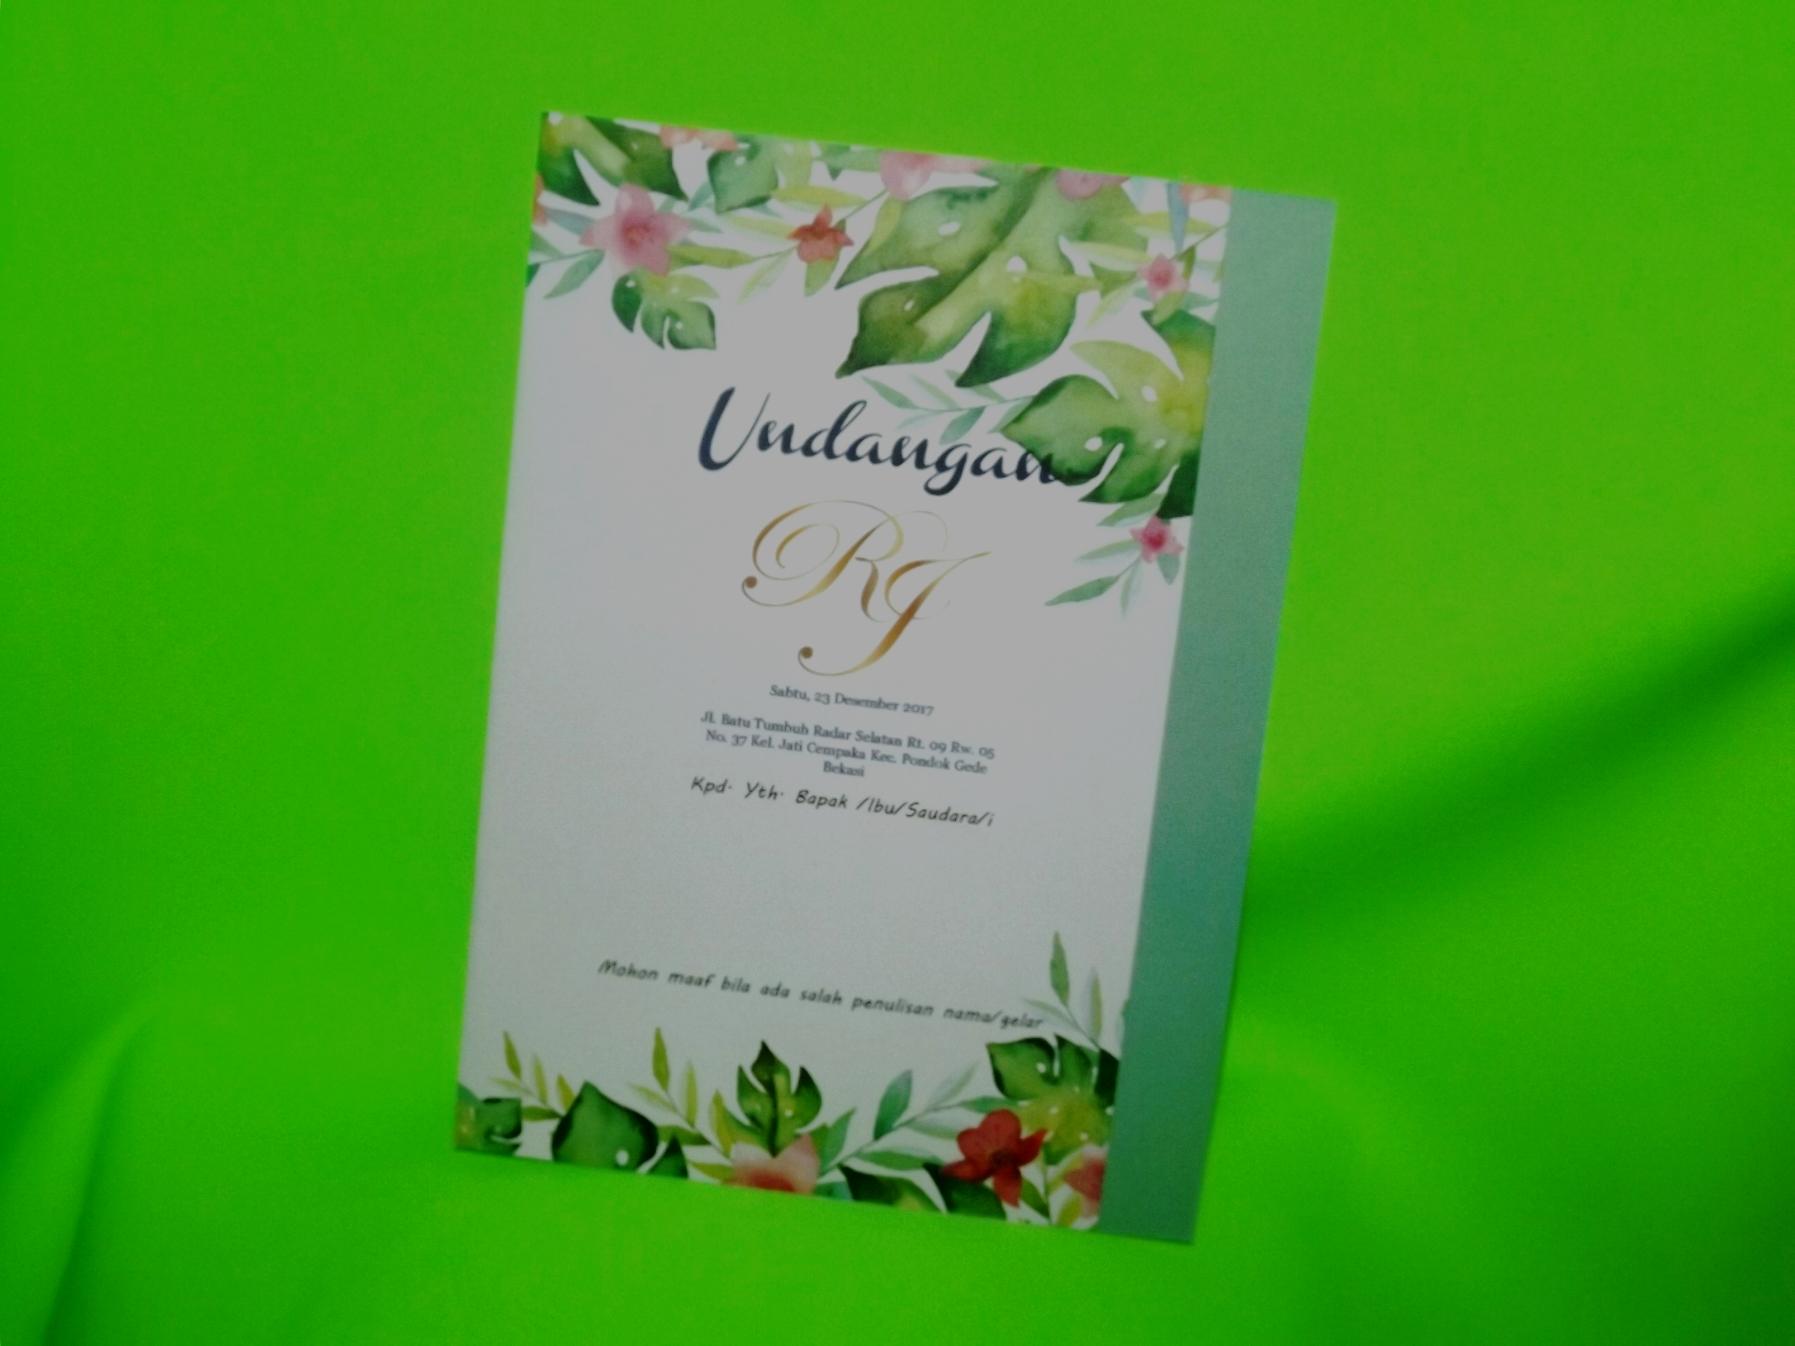 Undangan Pernikahan Three Diamonds Card Wedding Invitations